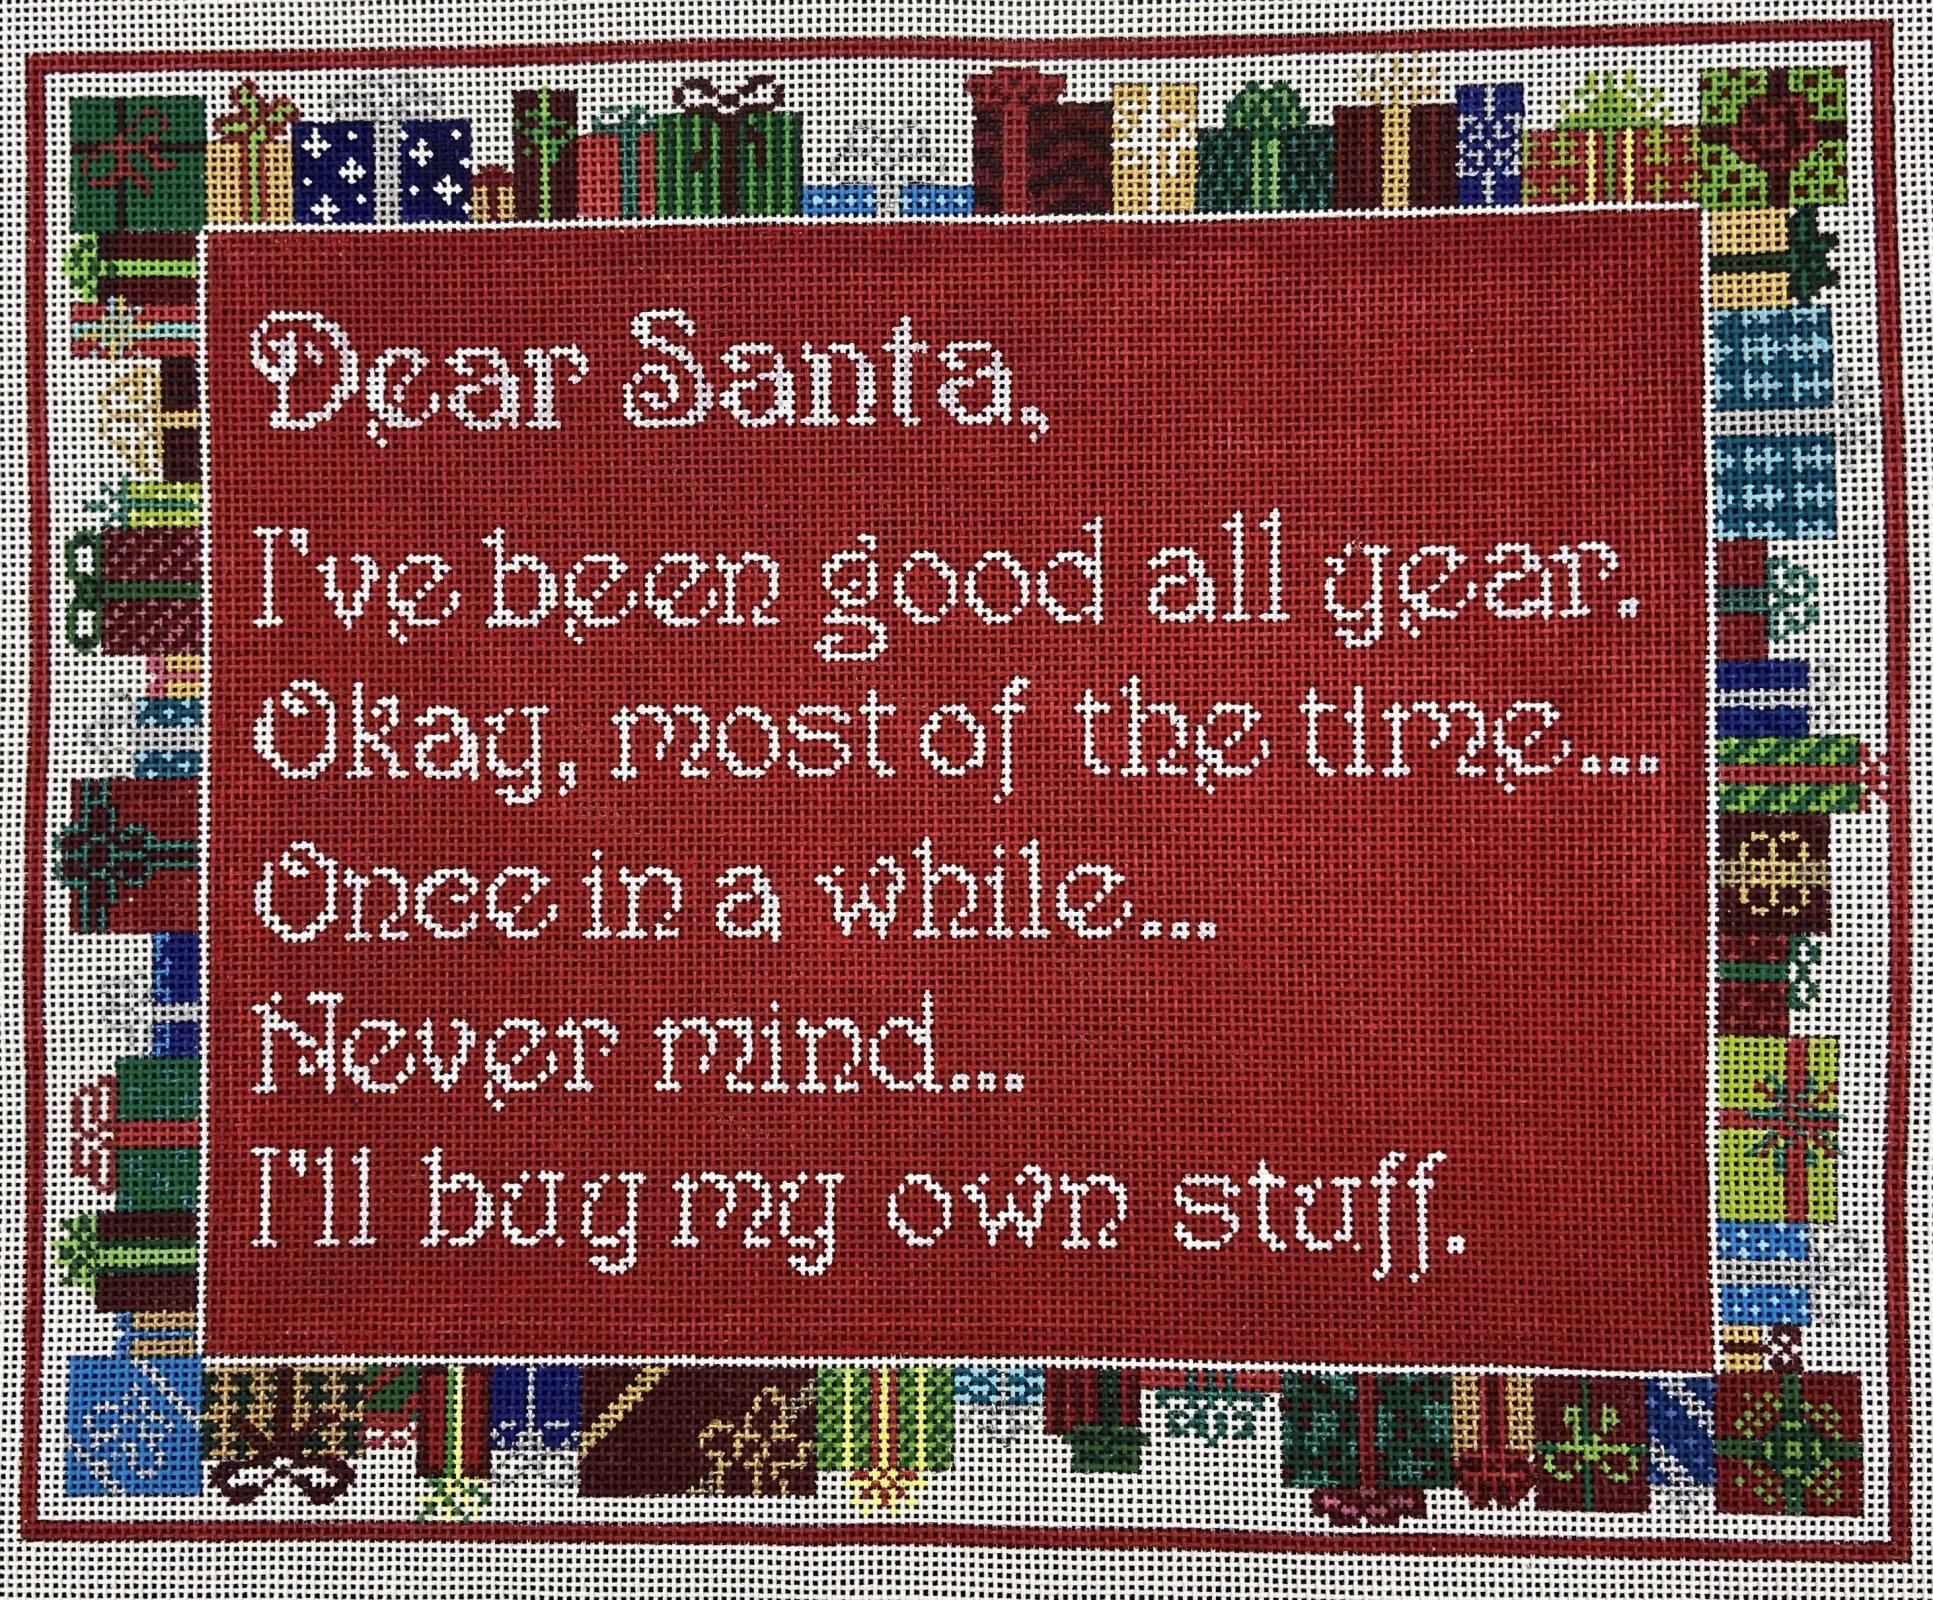 SS53 Dear Santa ... I'll buy my own stuff Christmas Sign CBK Needlepoint